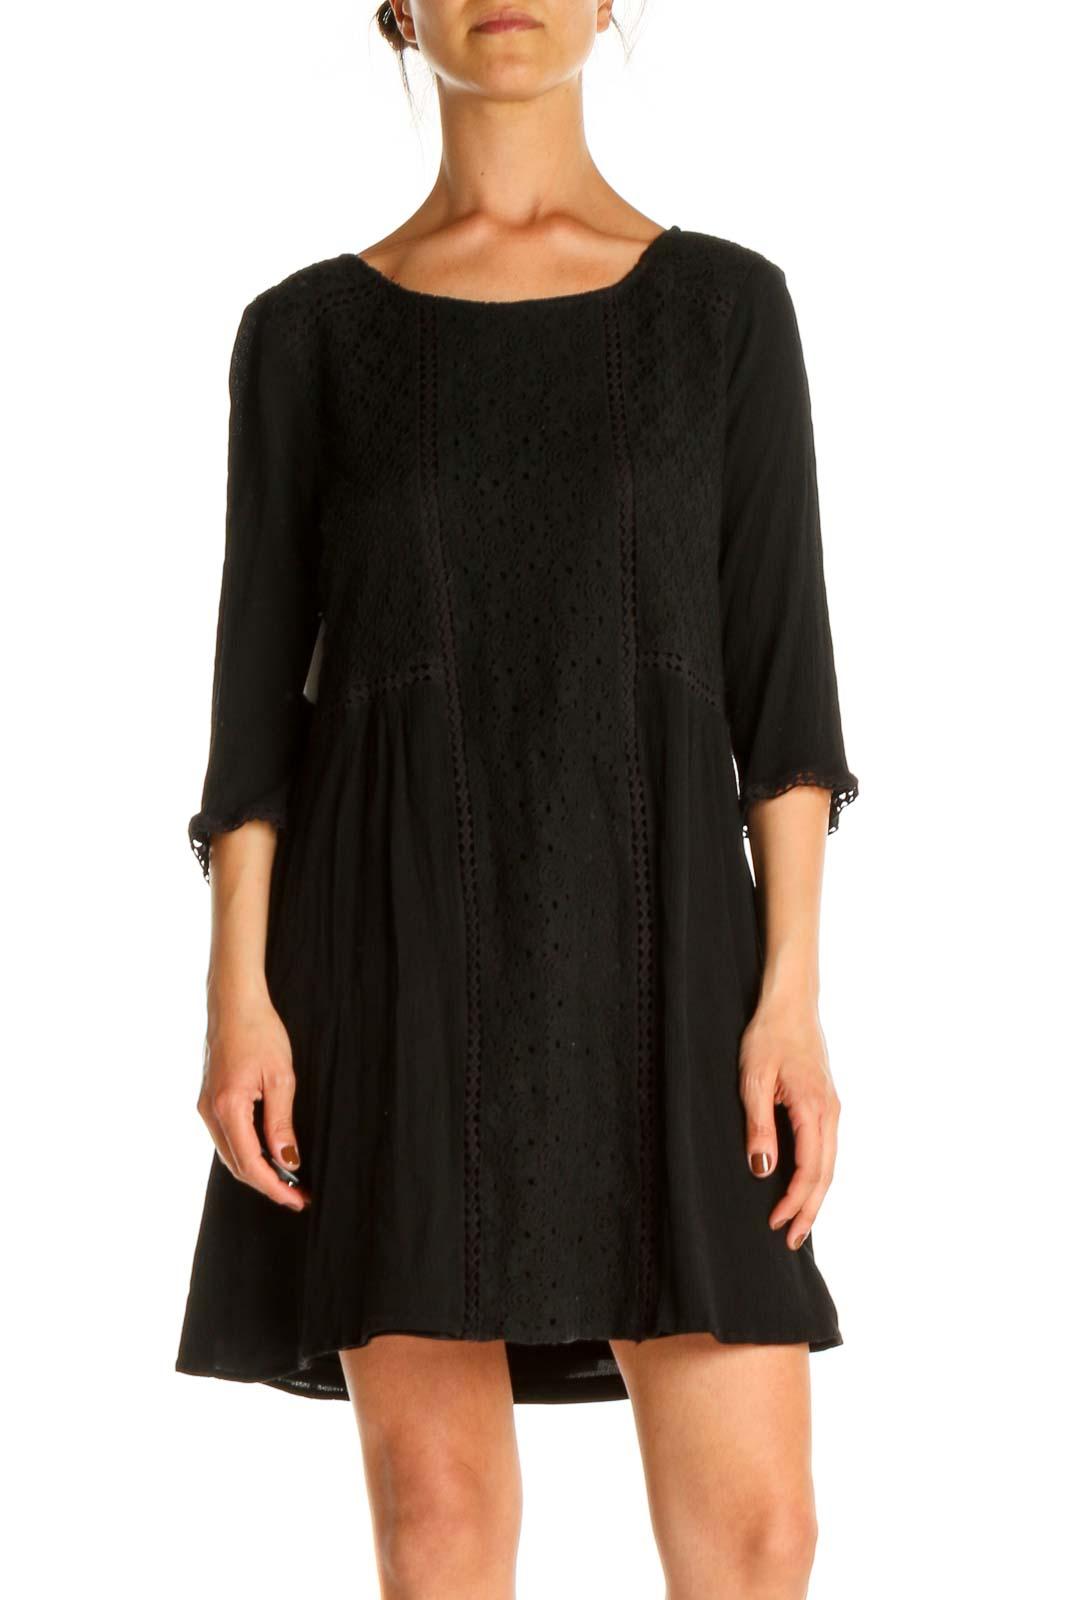 Black Lace Bohemian Dress Front